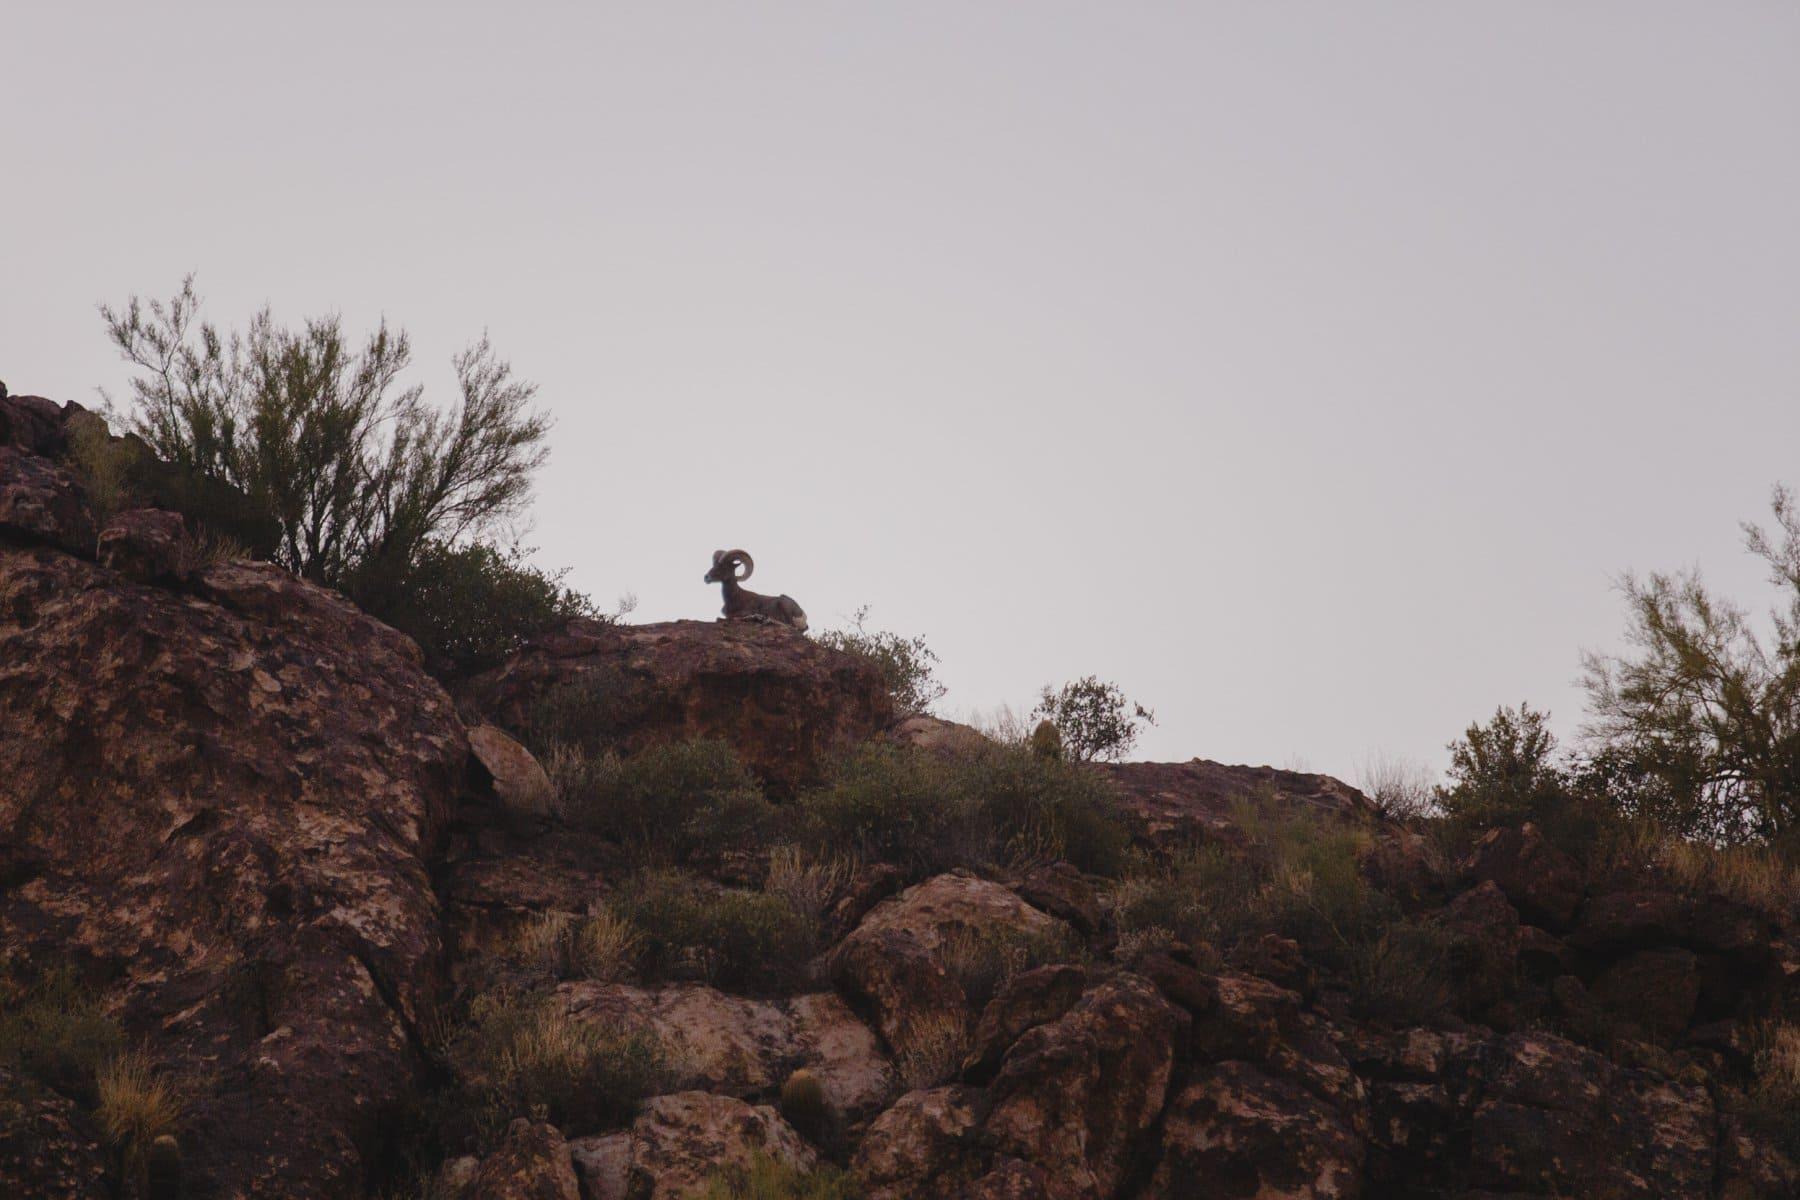 big horn sheep from Desert Belle tour boat Saguaro Lake